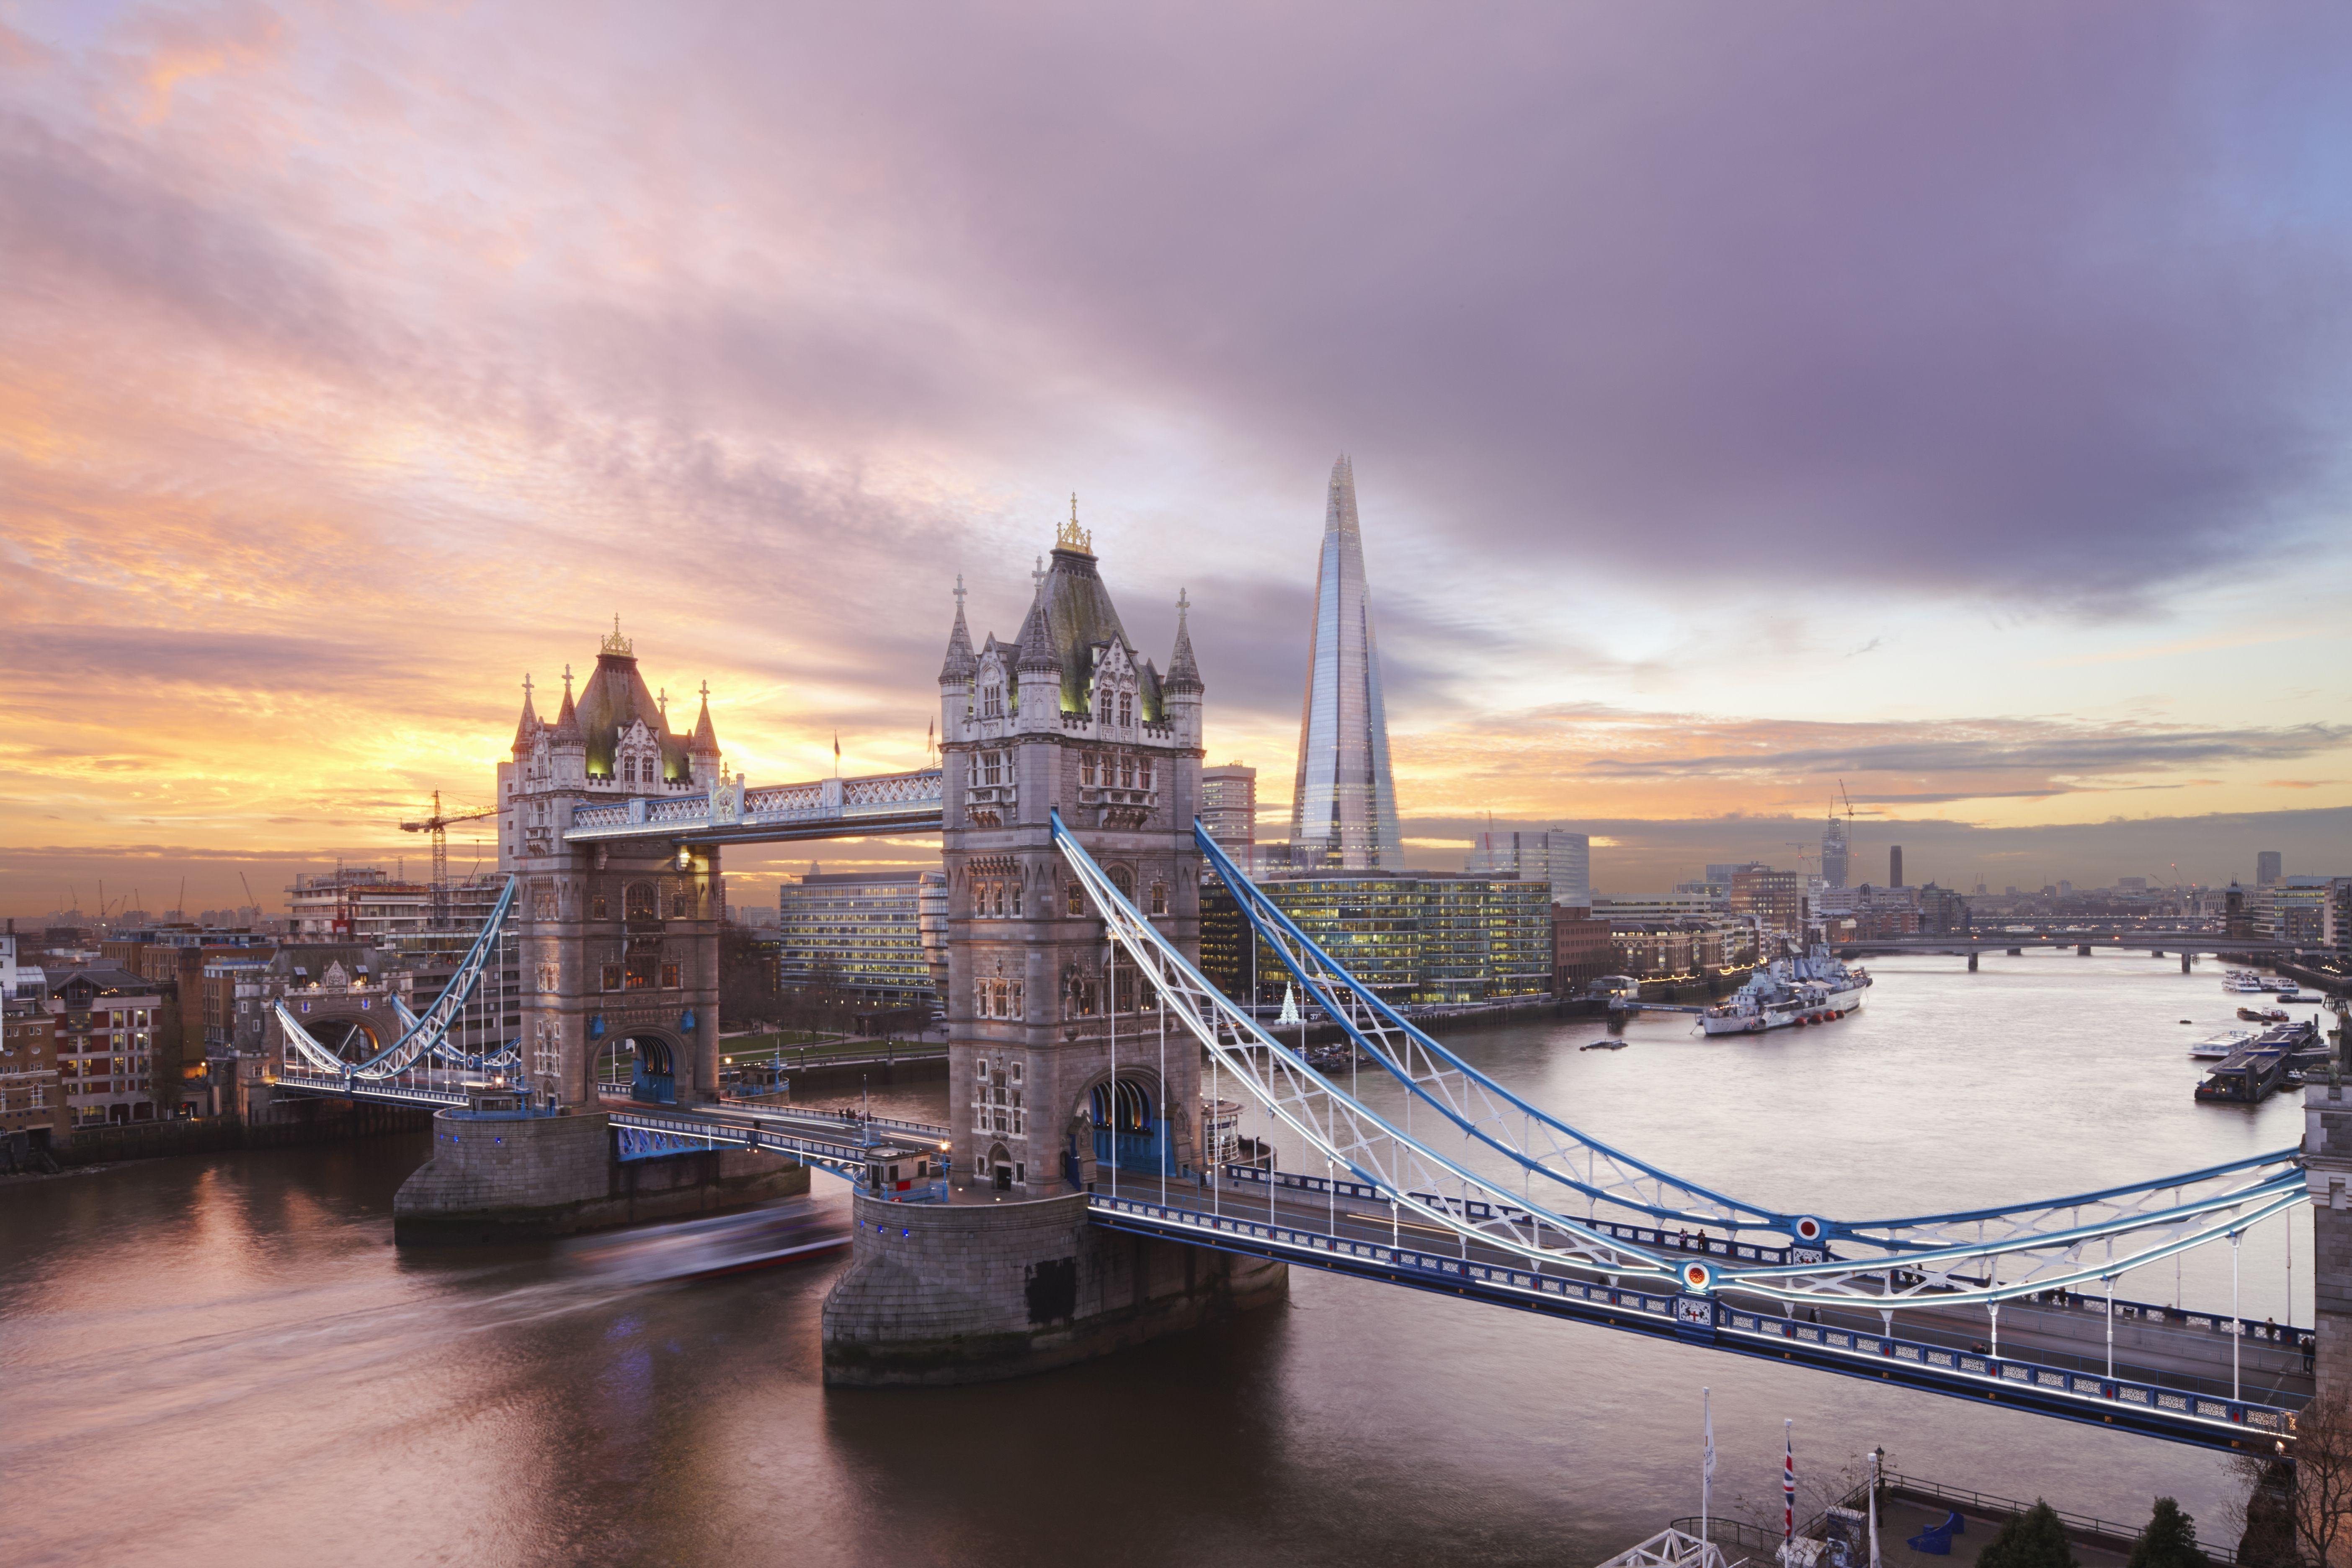 Tower Bridge and The Shard at sunset, London